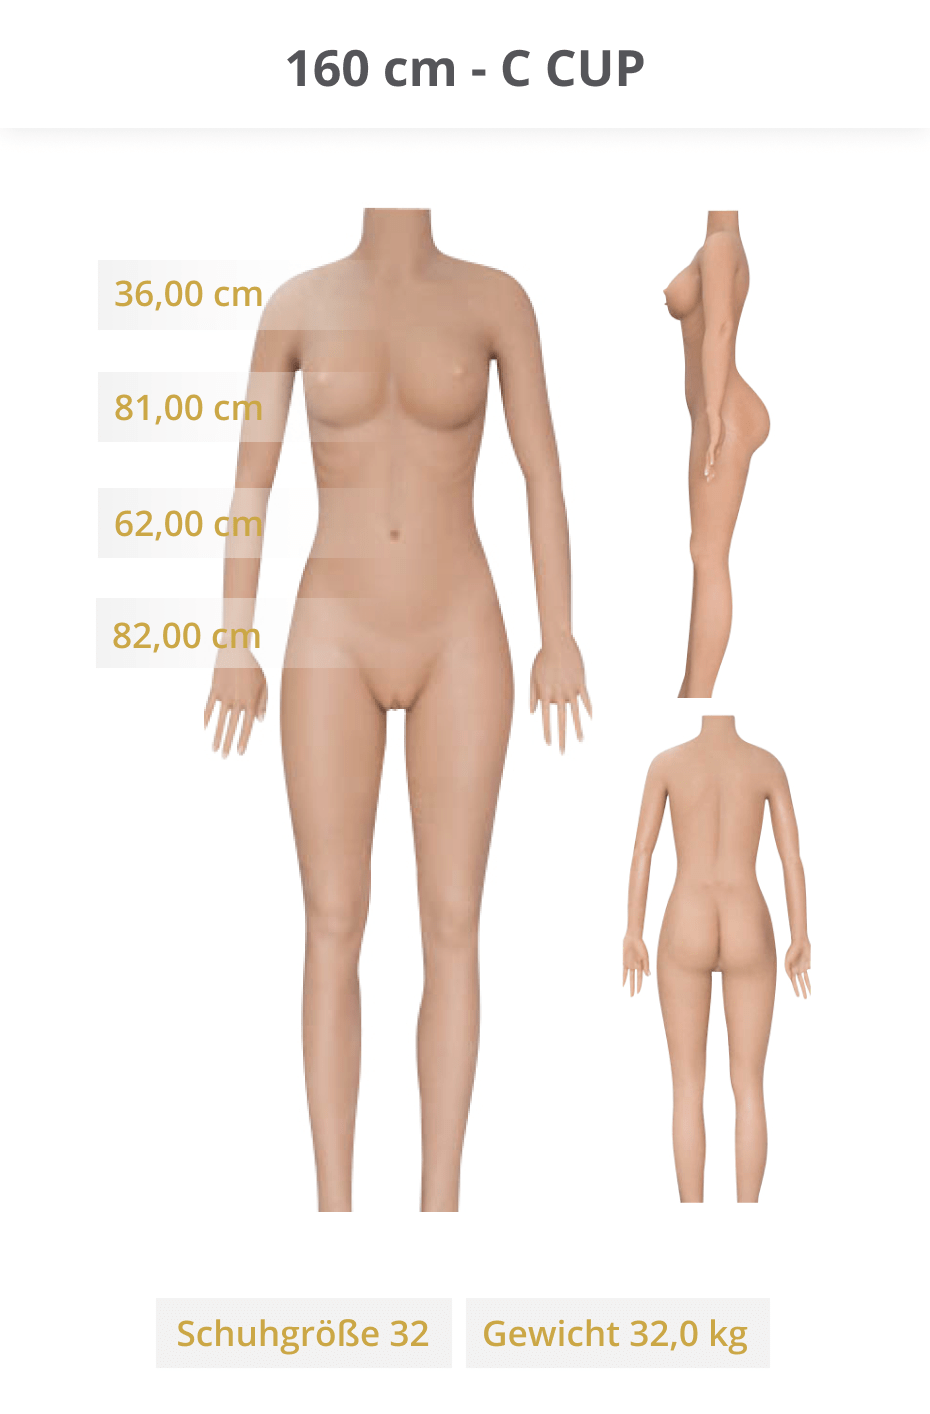 JY-Doll-160-cm-C-CUP